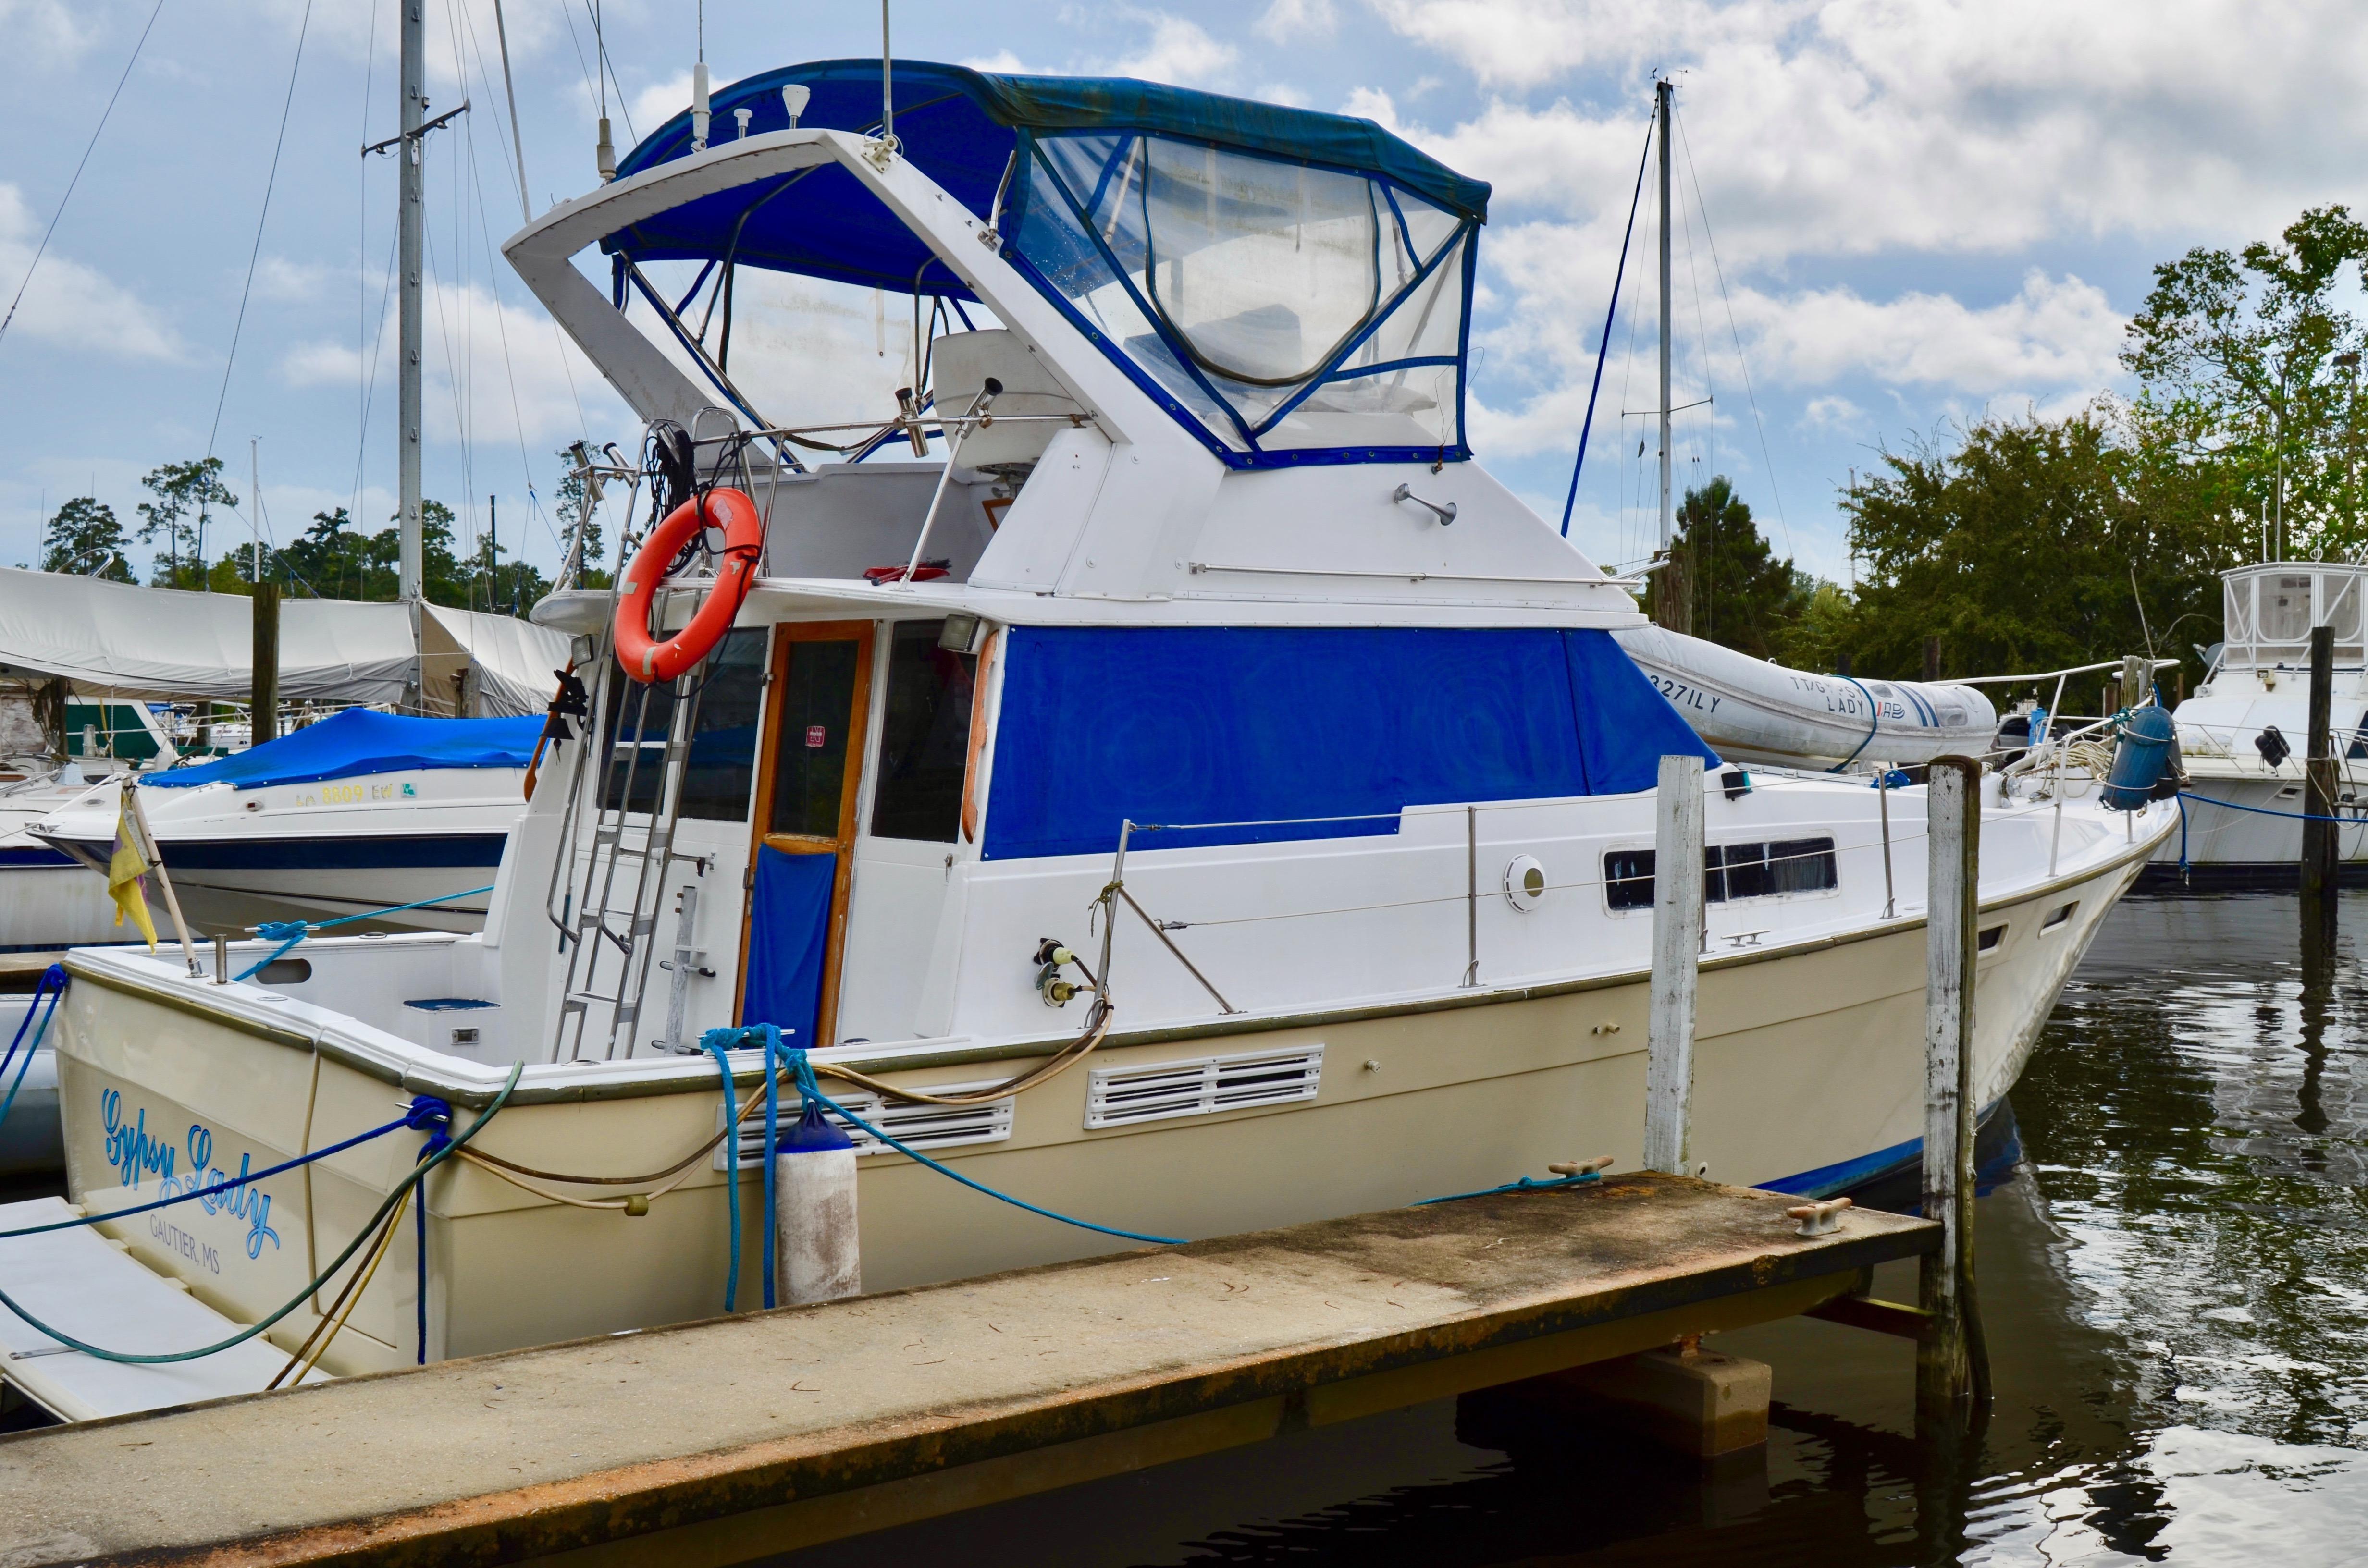 Bayliner 3870 Motoryacht At Dock